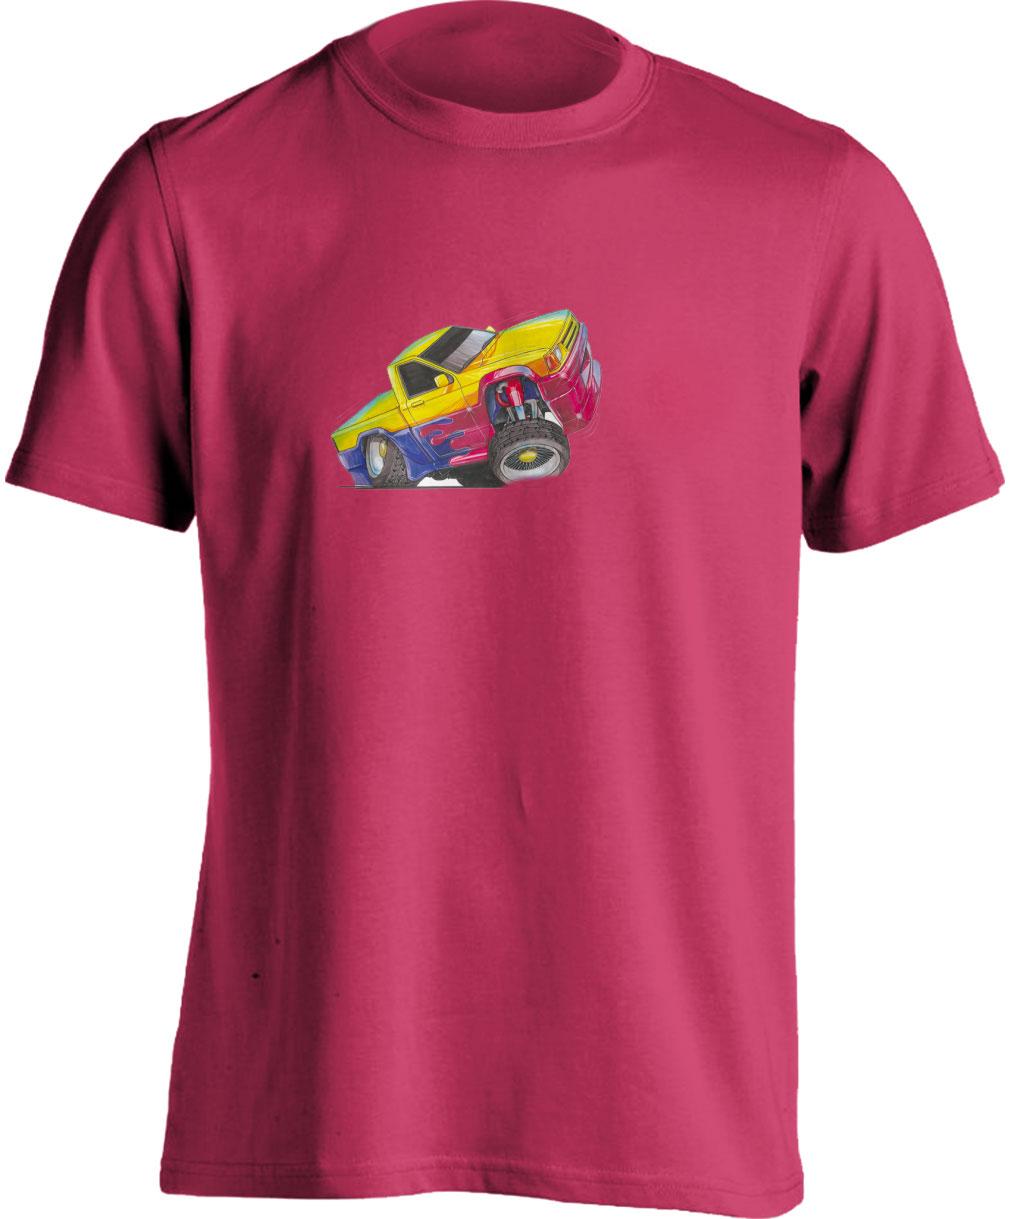 Koolart Pick Up Yellow/Blue/Red – 1053 Child's T Shirt